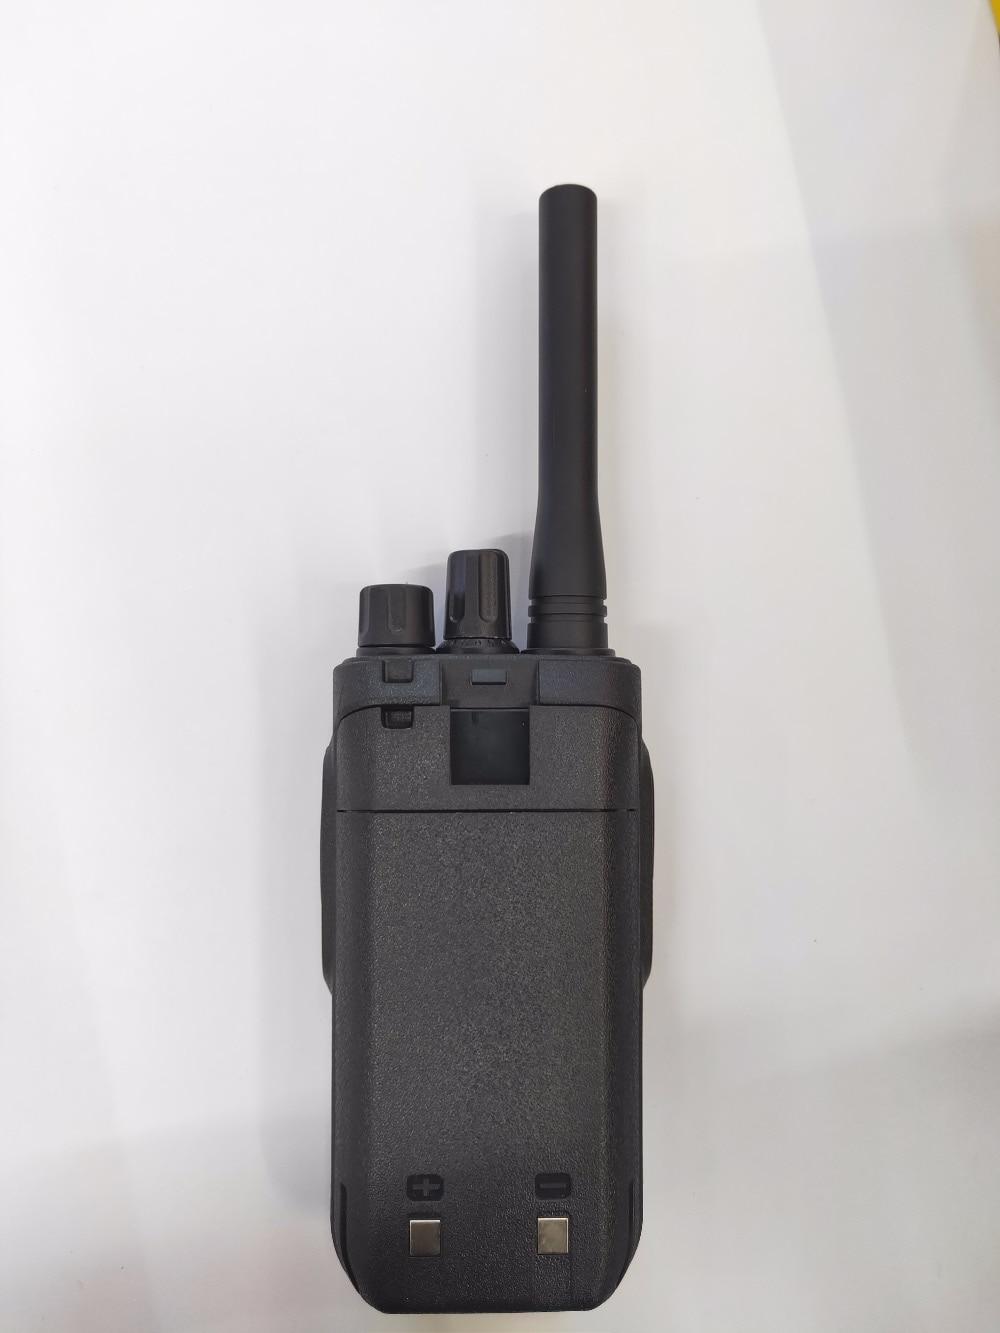 TYT TC-999 handheld Walkie Talkie UHF 400~480Mhz Two Way Radio ham Transceiver